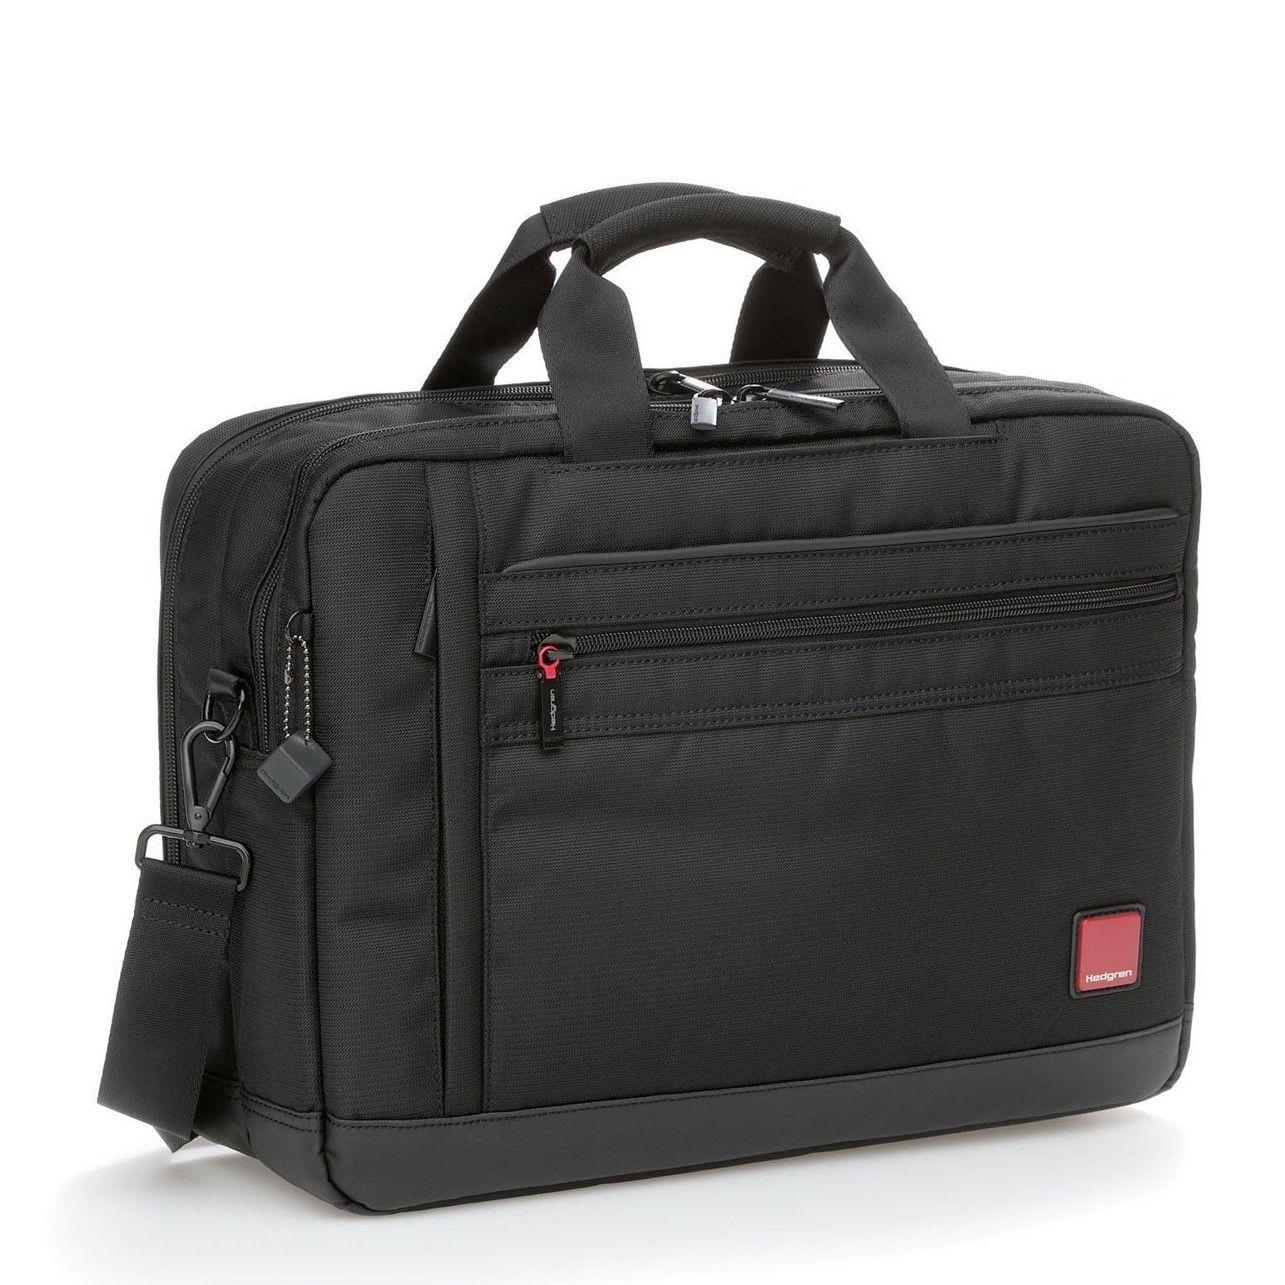 Taška na notebook Hedgren Red Tag Landing Business bag 15 1df1ca67ac2